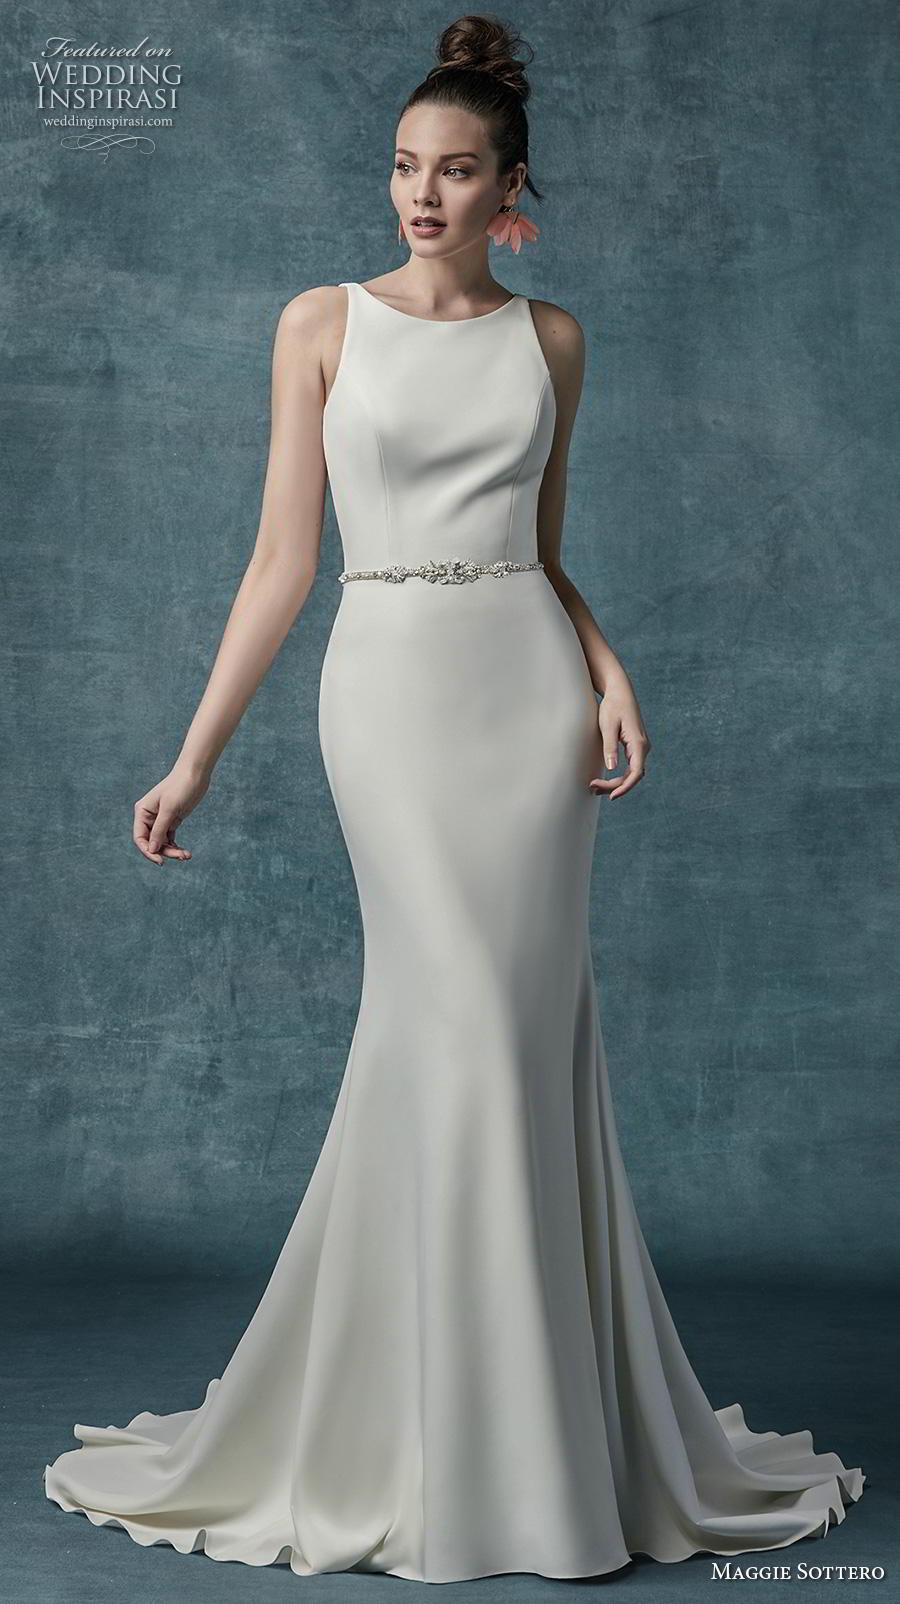 maggie sottero spring 2019 bridal sleeveless bateau neckline simple minimalist elegant fit and flare wedding dress backless low back medium train (15) mv